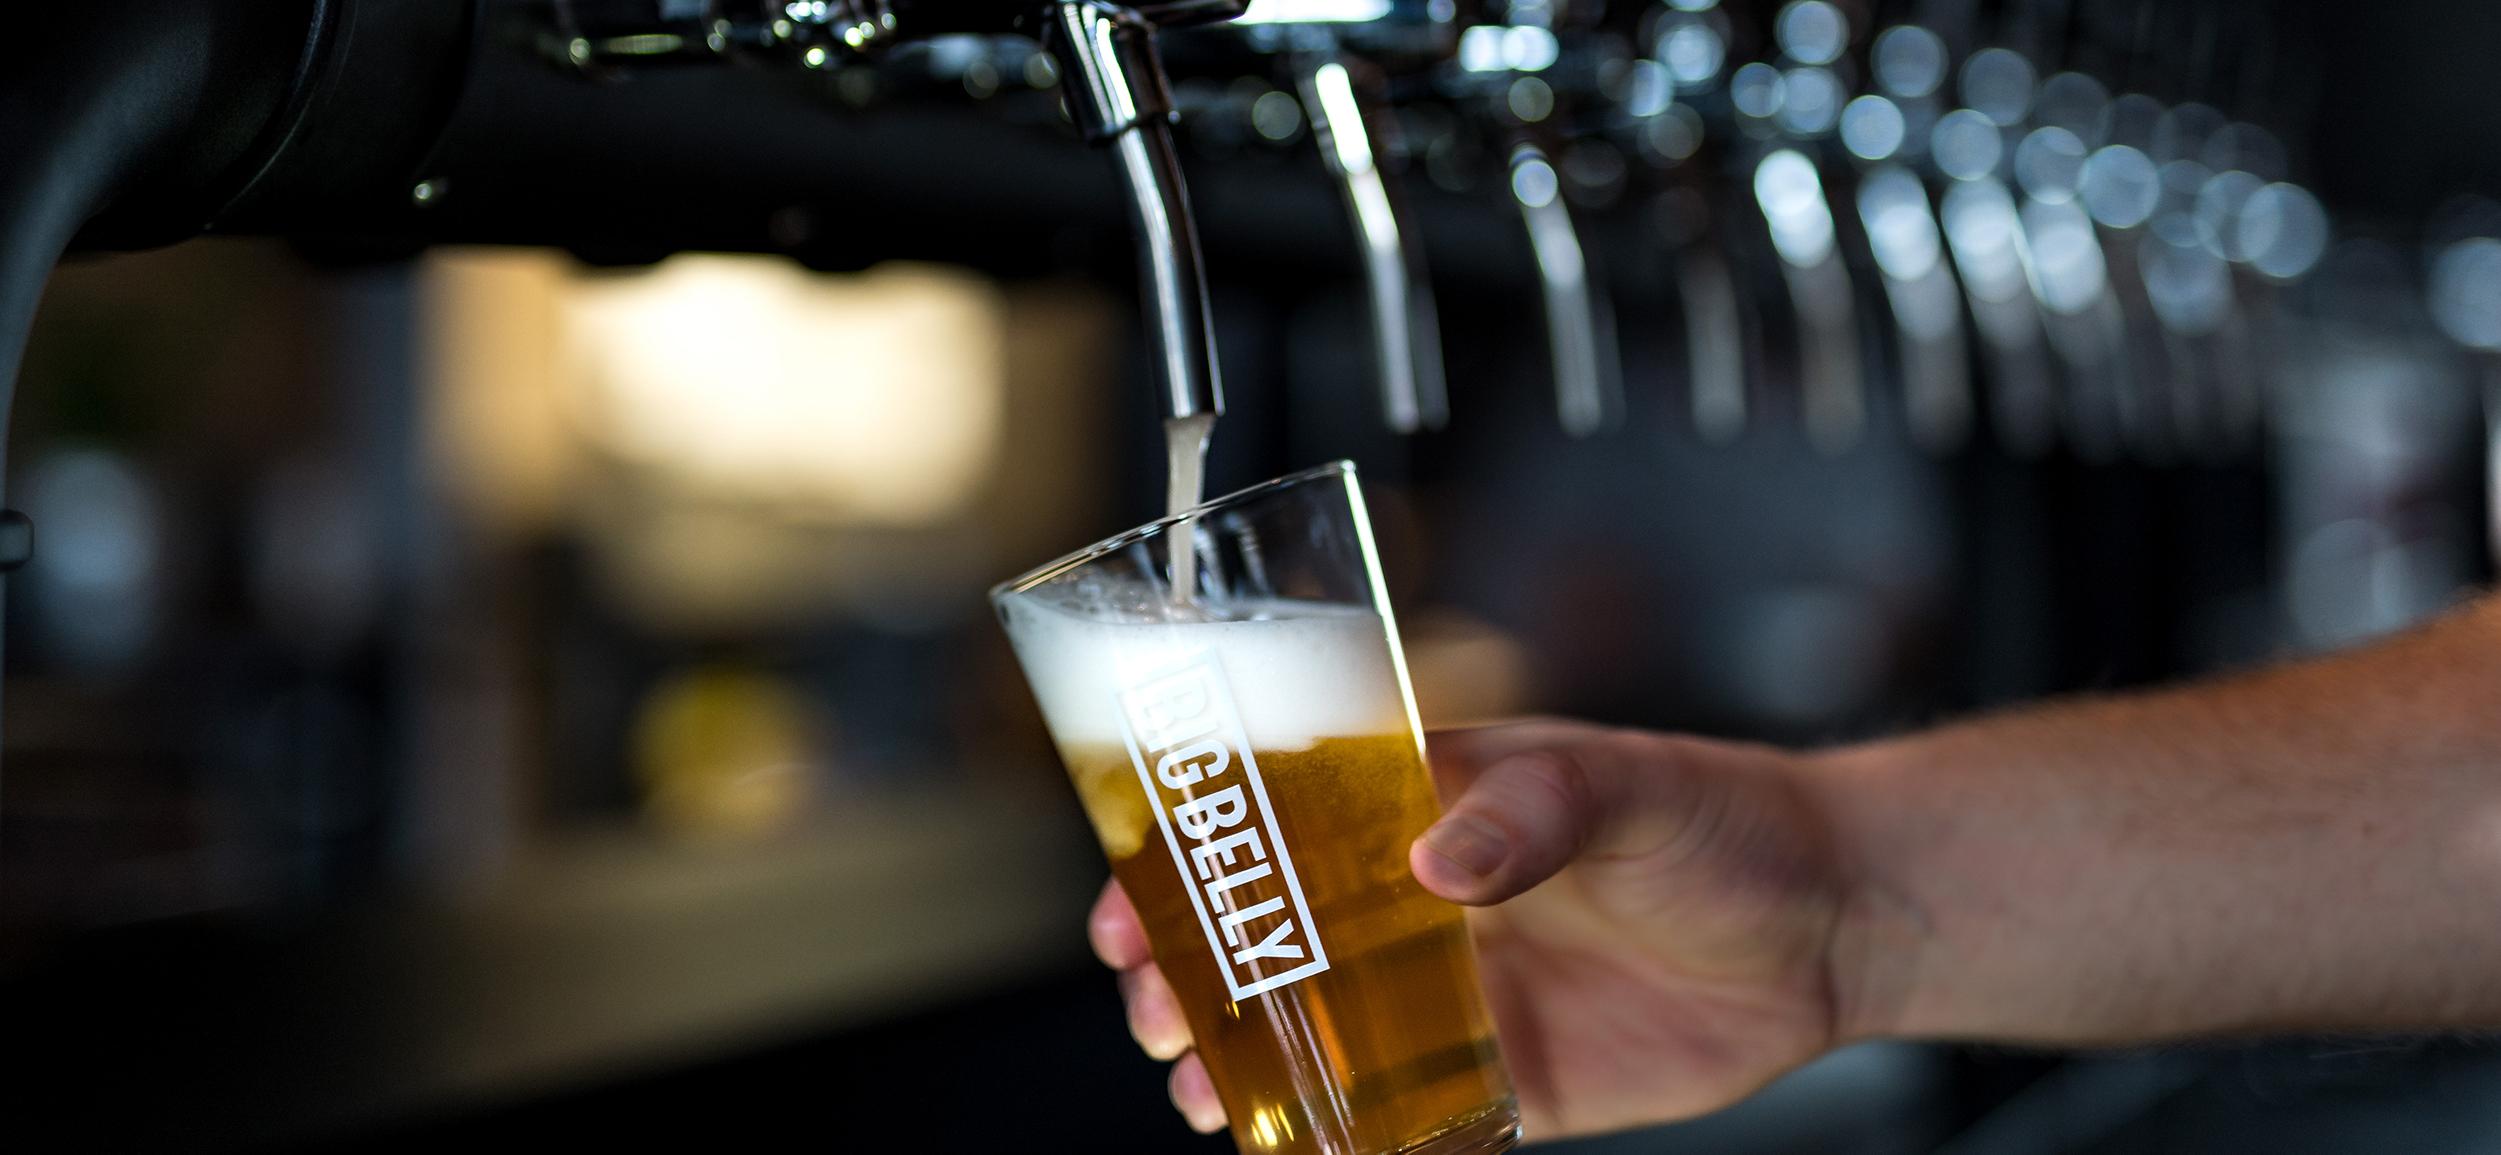 Brouwerij Breda